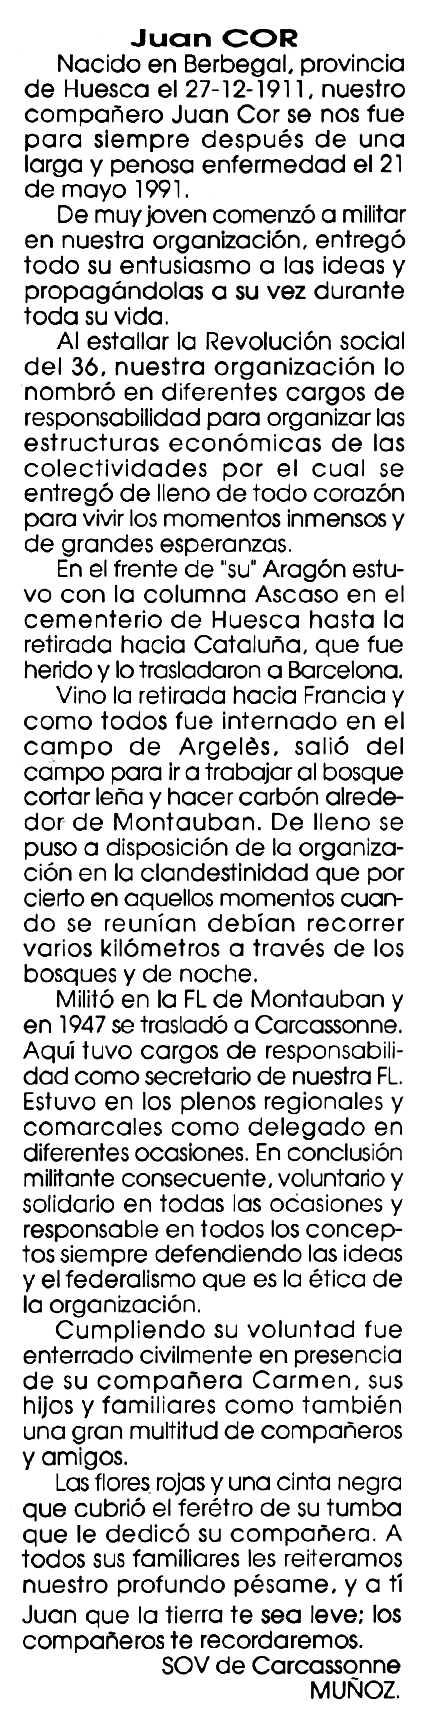 "Necrològica de Juan Cor Buisán apareguda en el periòdic tolosà ""Cenit"" del 19 de setembre de 1991"